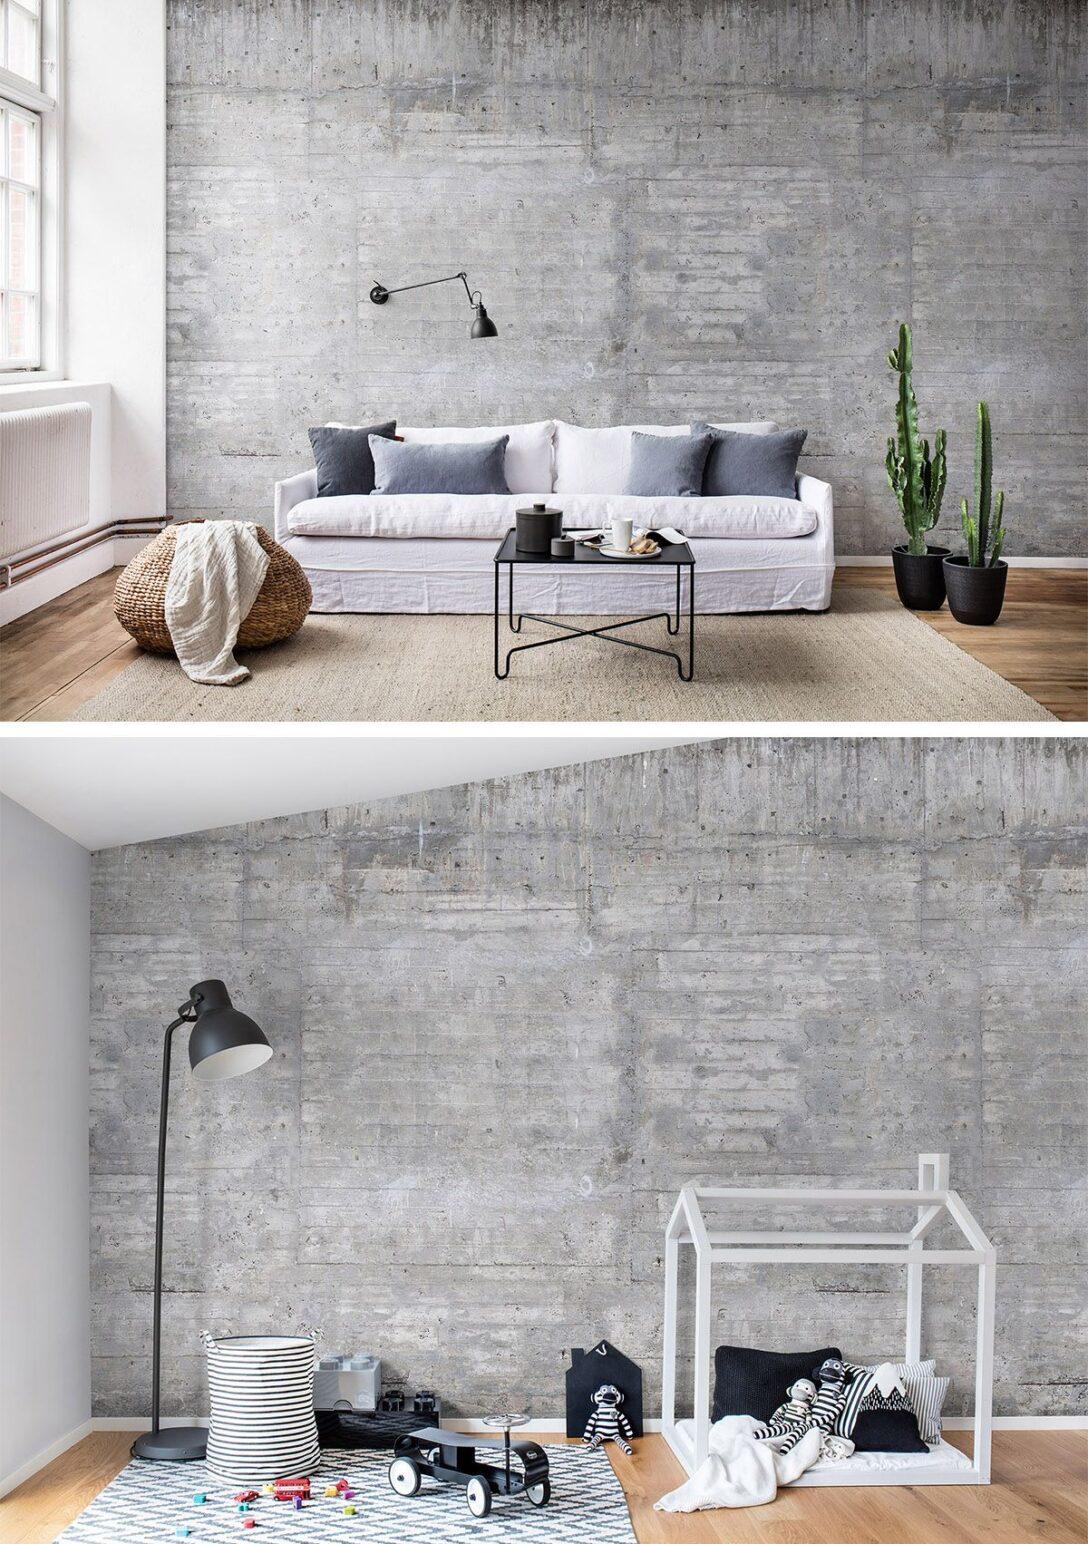 Large Size of Schlafzimmer Tapete Tapeten Grau Braun 2019 Modern Tapezieren Ideen Graue Blau Trends 3d Silber Wooden Concrete In 2020 Wandgestaltung Schränke Rauch Teppich Wohnzimmer Schlafzimmer Tapete